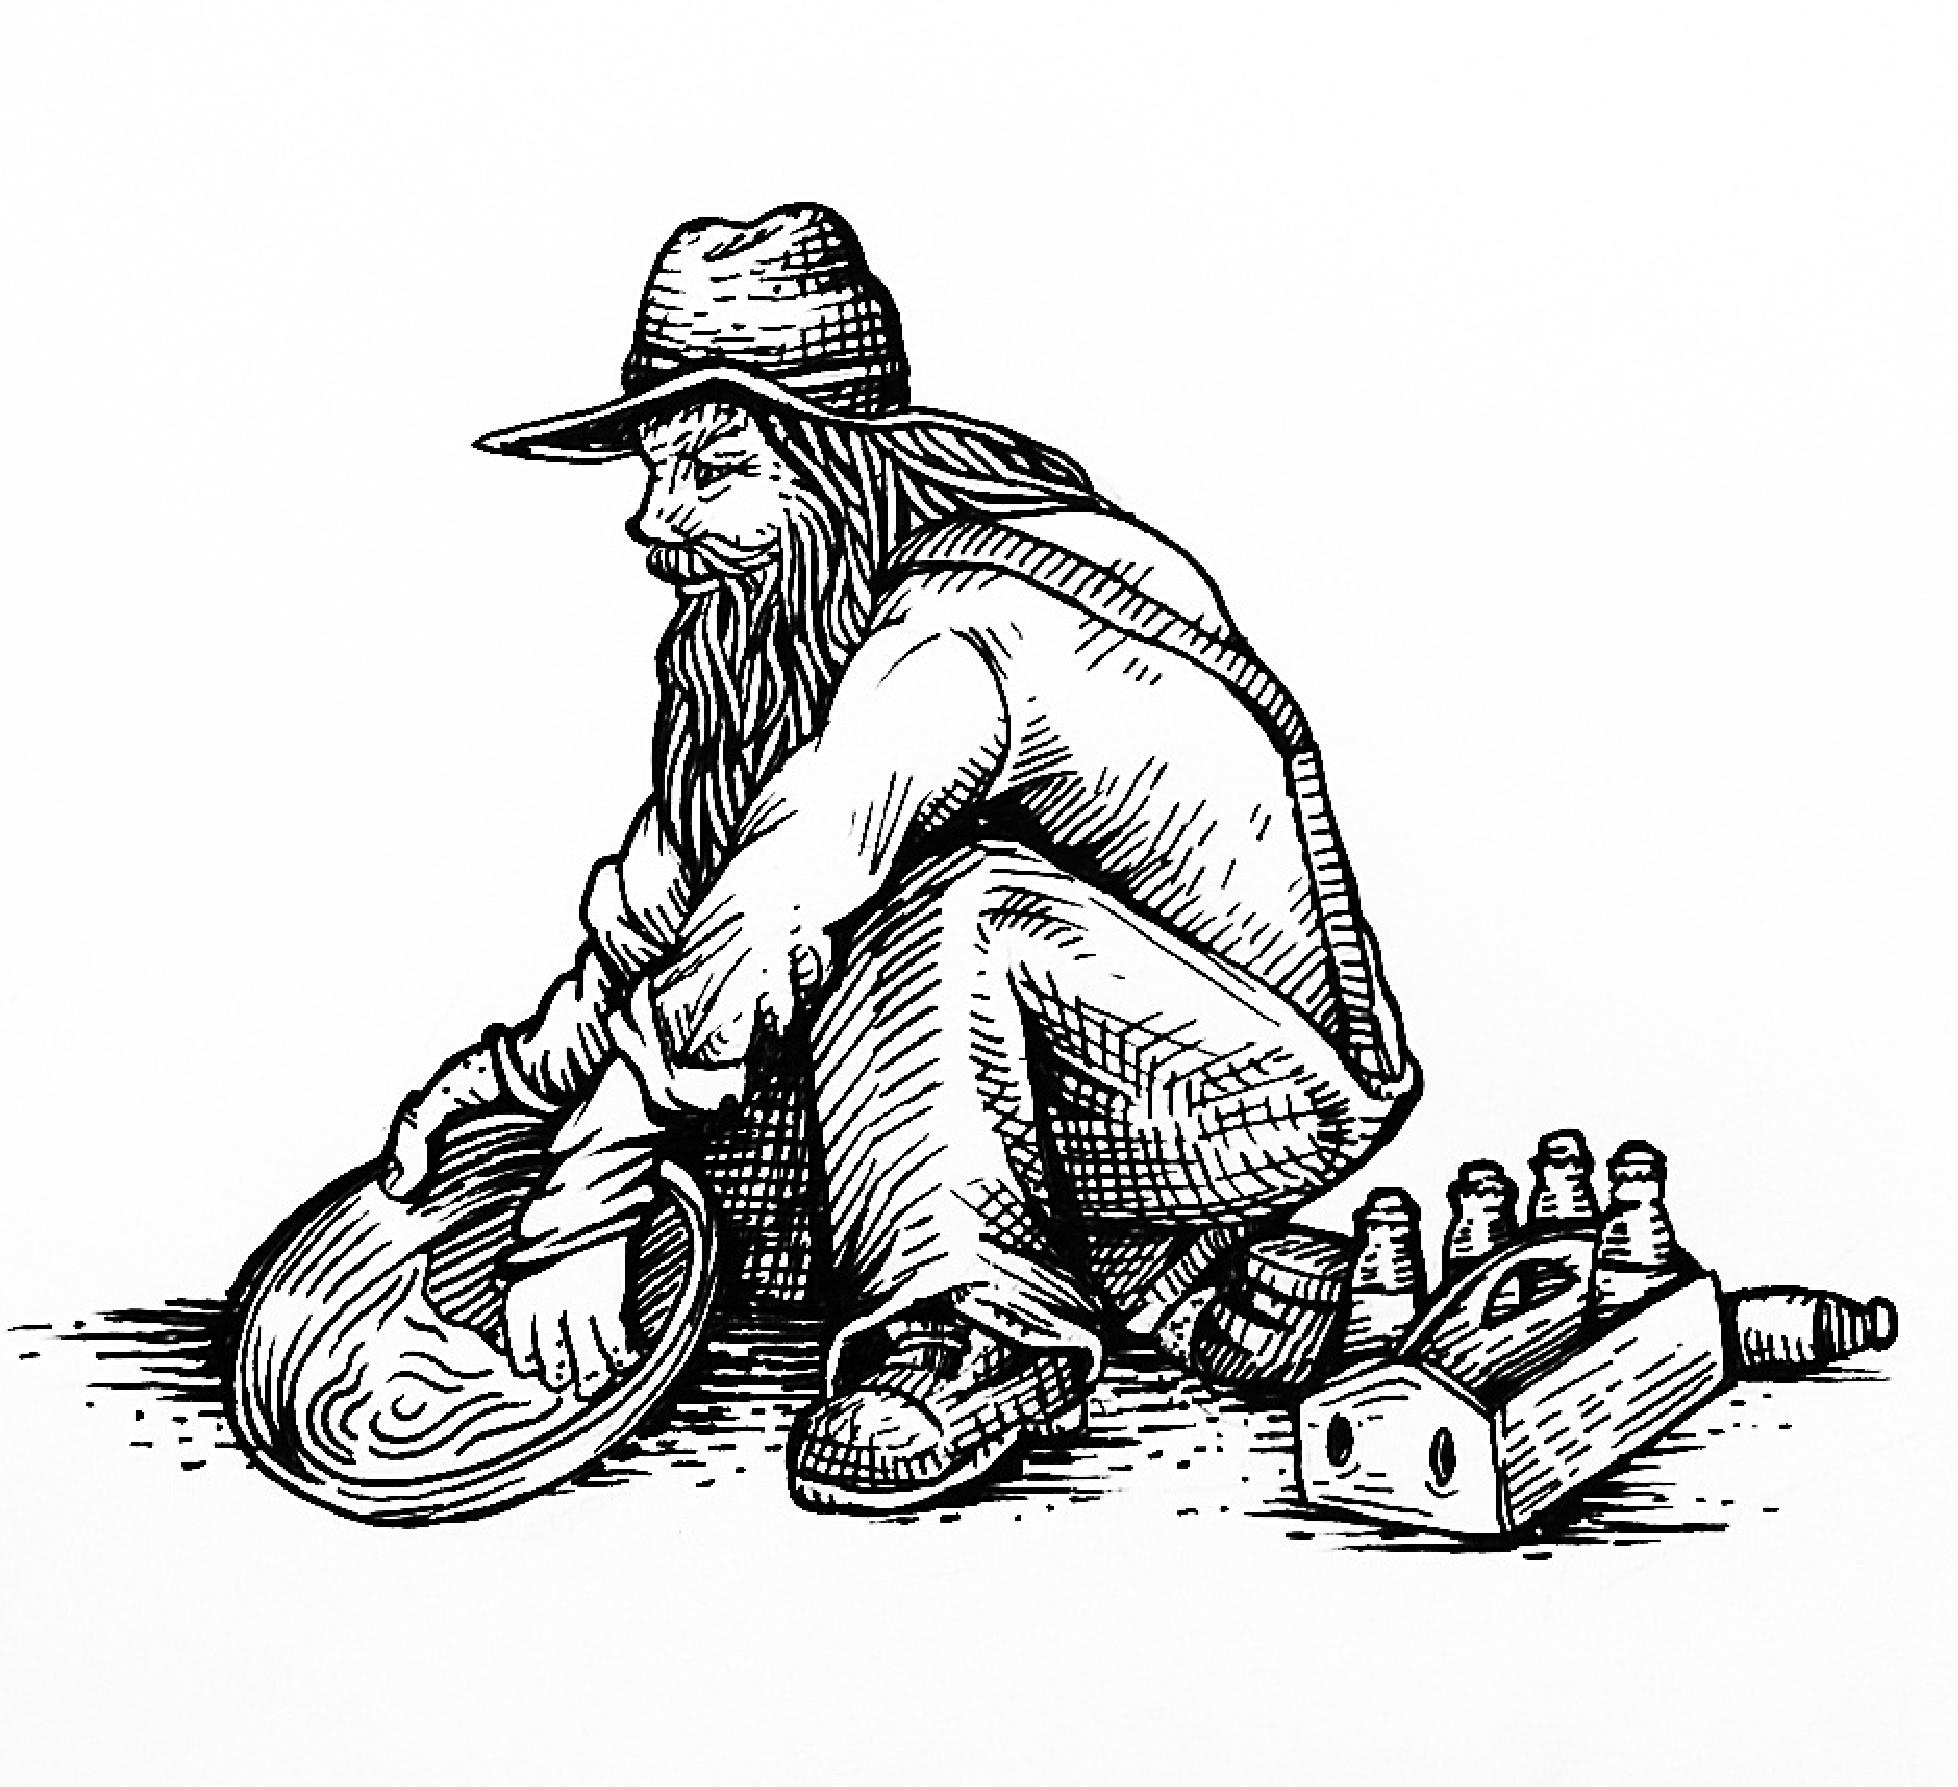 Prospector editable vector_Artboard 4.jpg